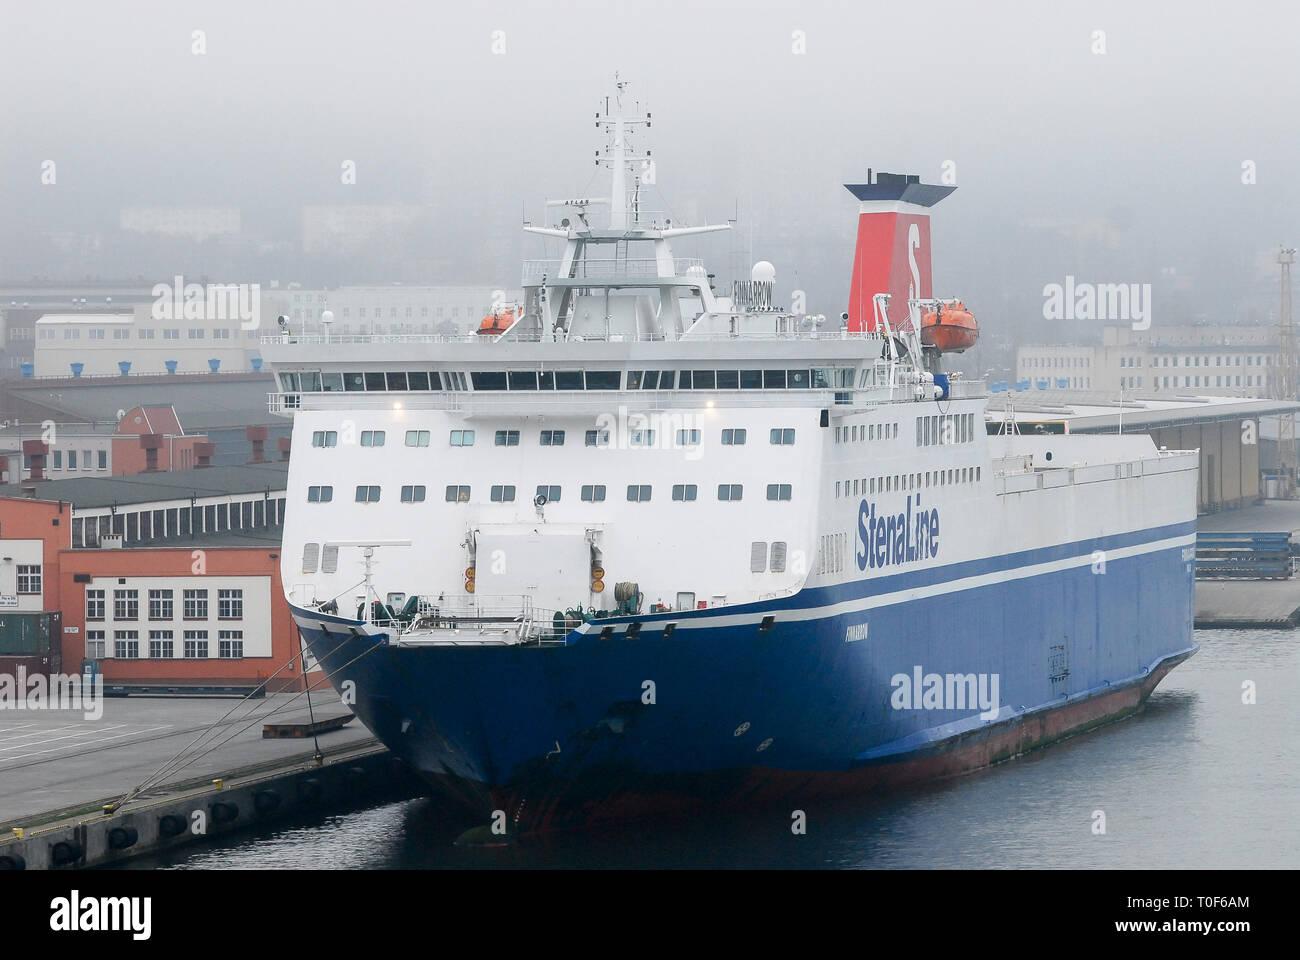 MS Finnarow, ro-pax ferry owned by Finnlines, in  Gdynia, Poland. April 12th 2008 © Wojciech Strozyk / Alamy Stock Photo - Stock Image